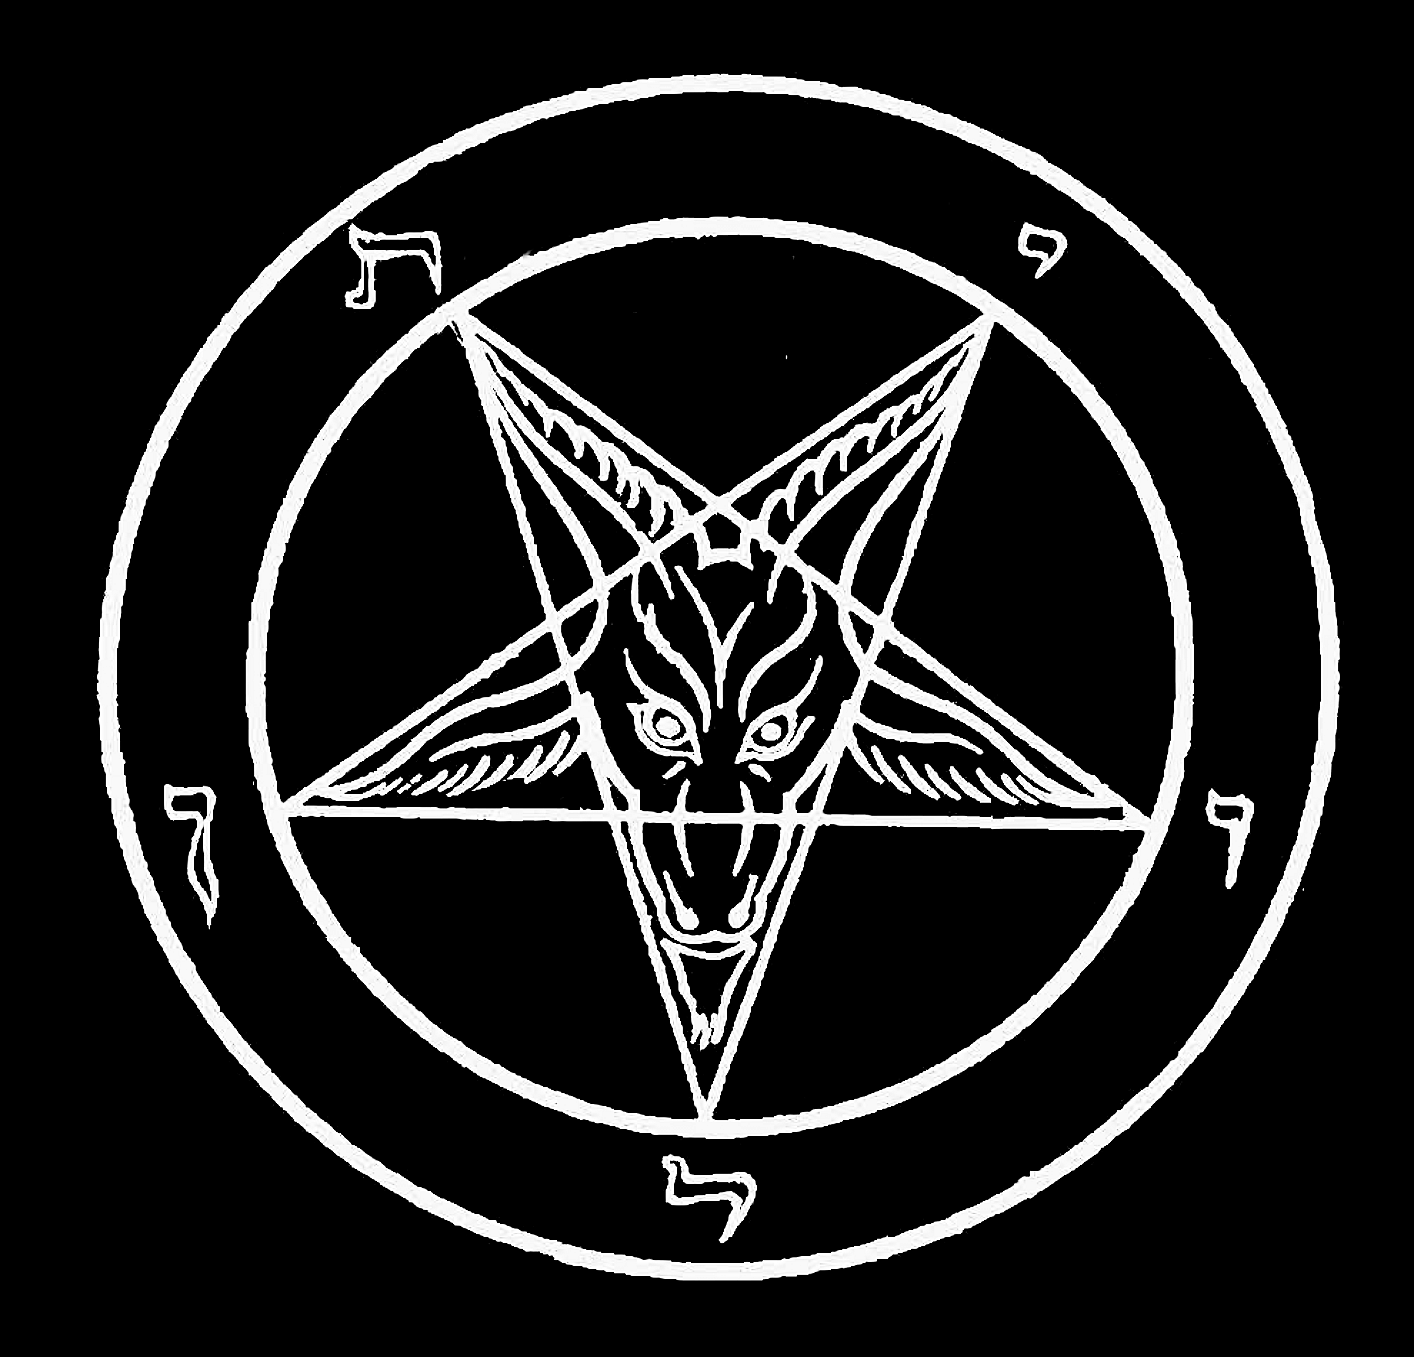 Mom Upset Over Satanic Symbol In School Bus Brake Lights Mma